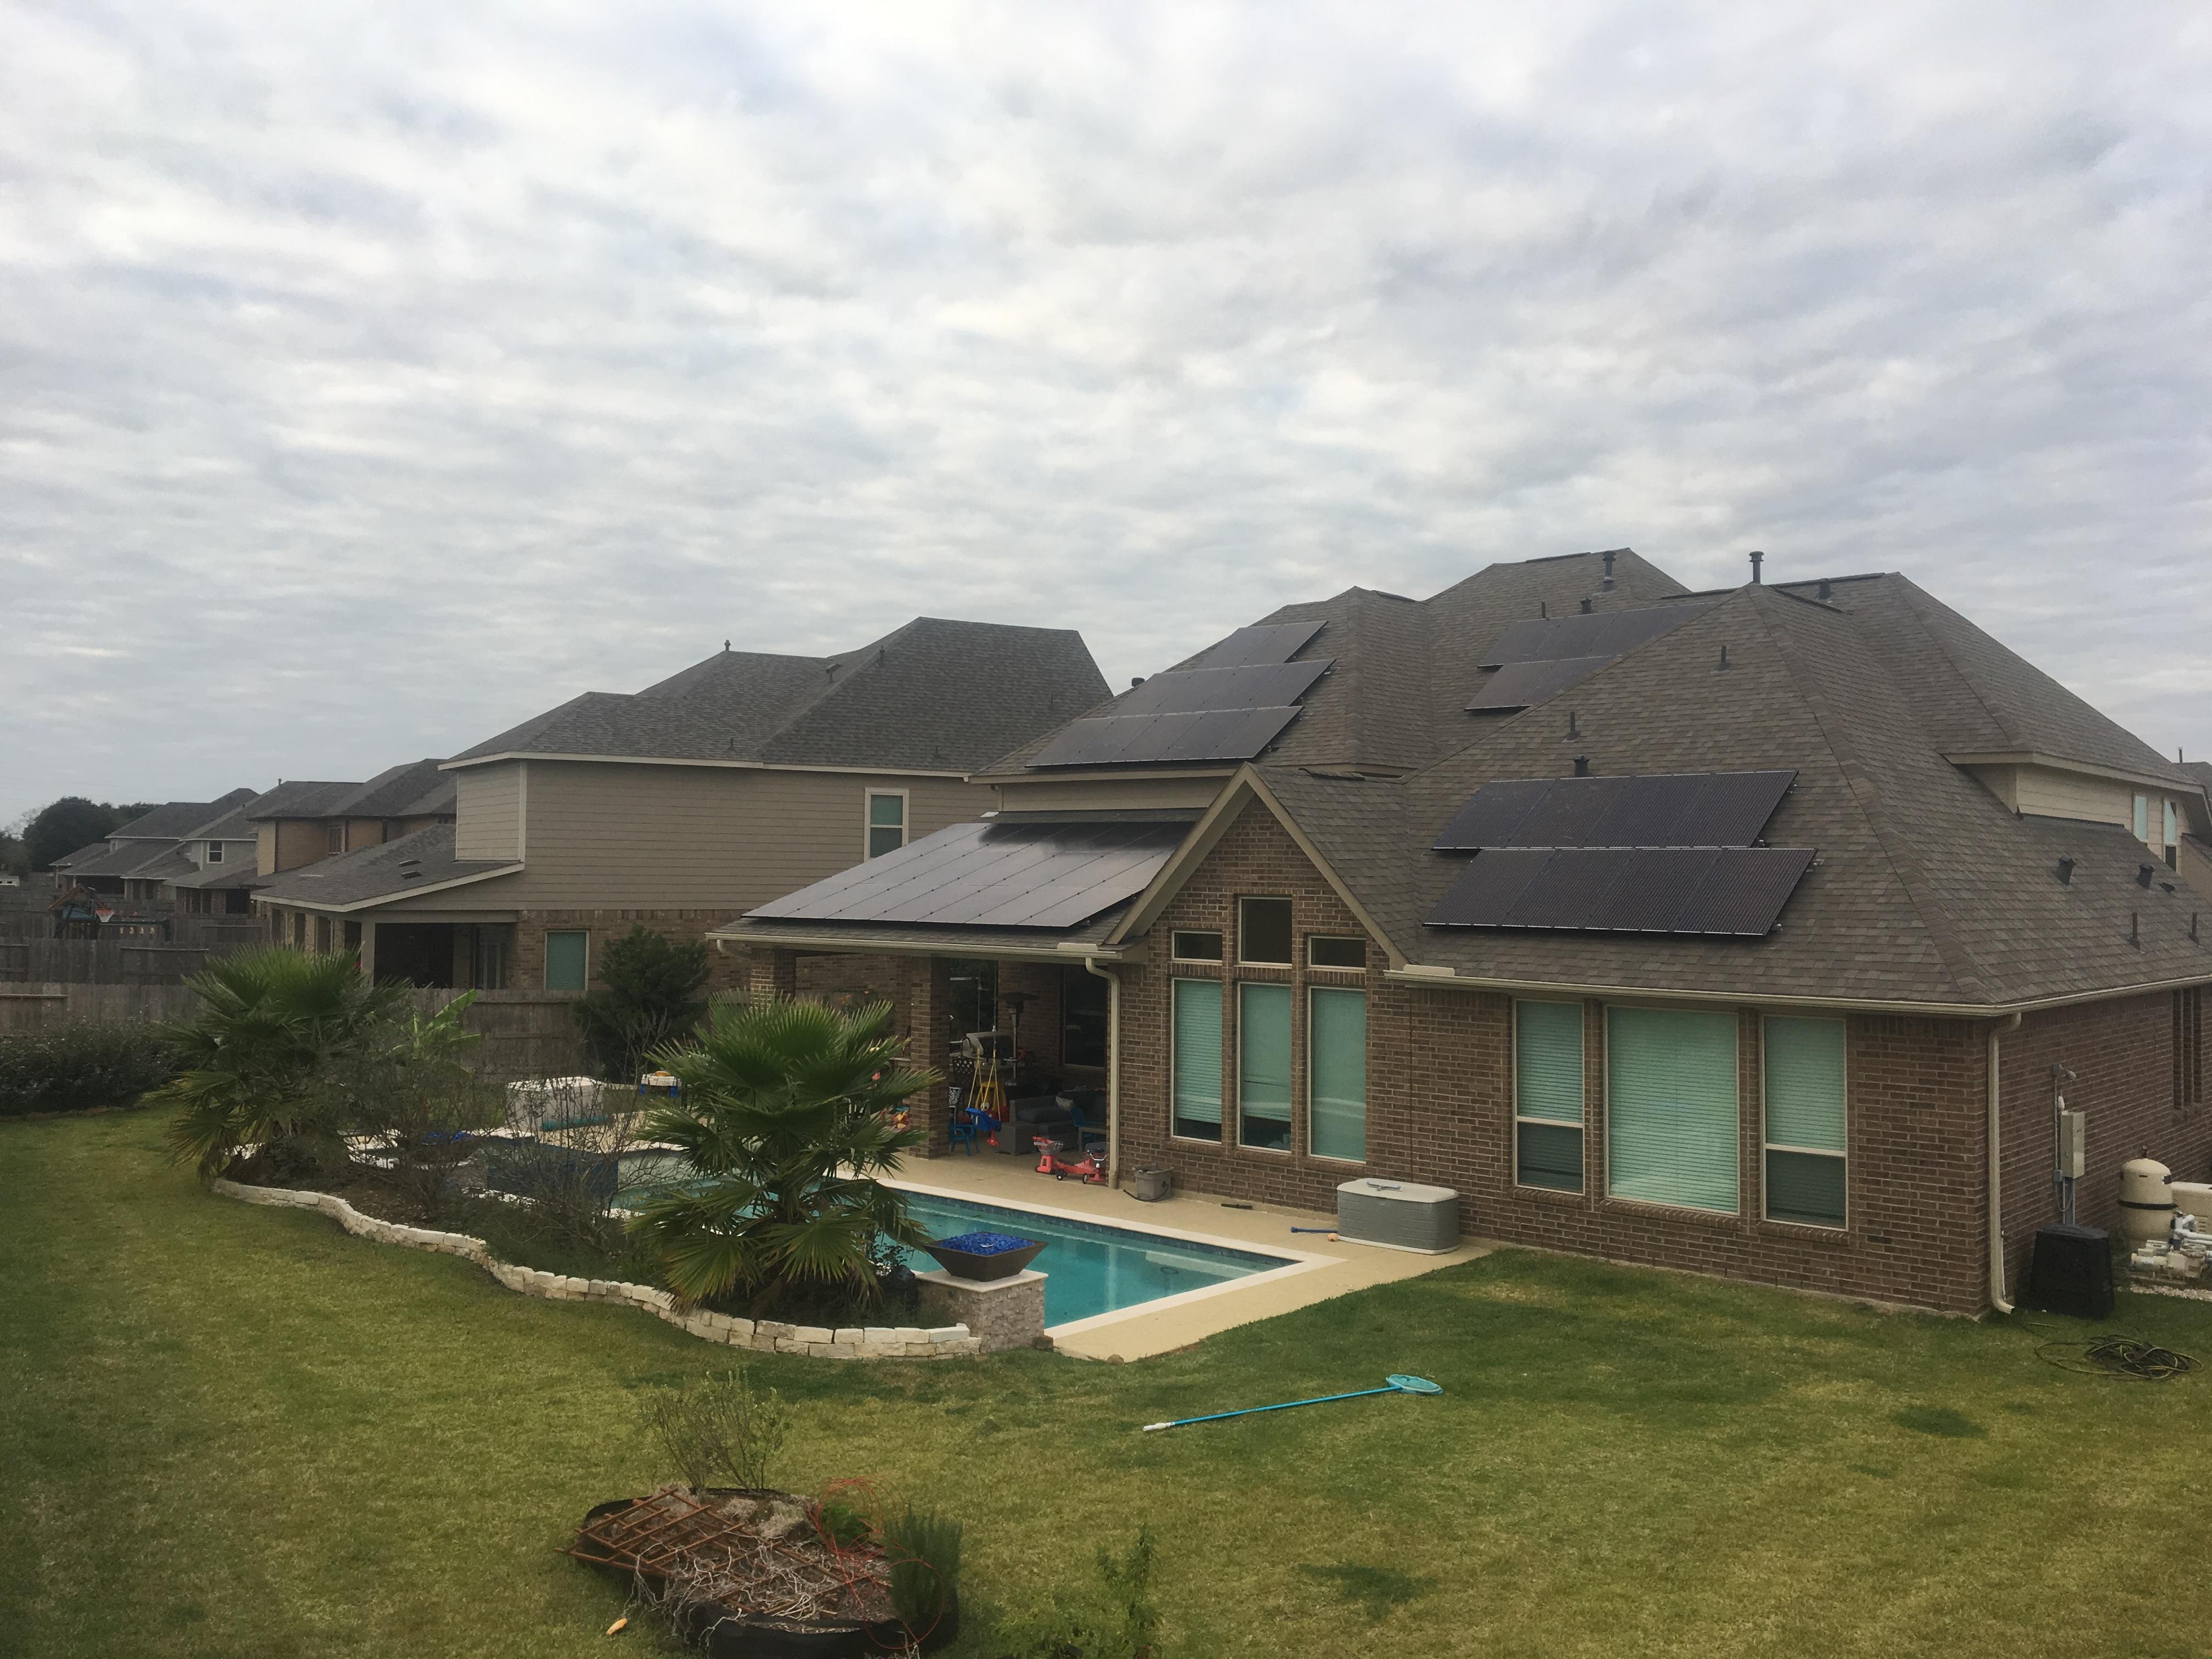 Houston Solar Tour – HREG on solar southern homes, solar tuscan homes, solar architecture, solar lighting, solar craftsman house plans,